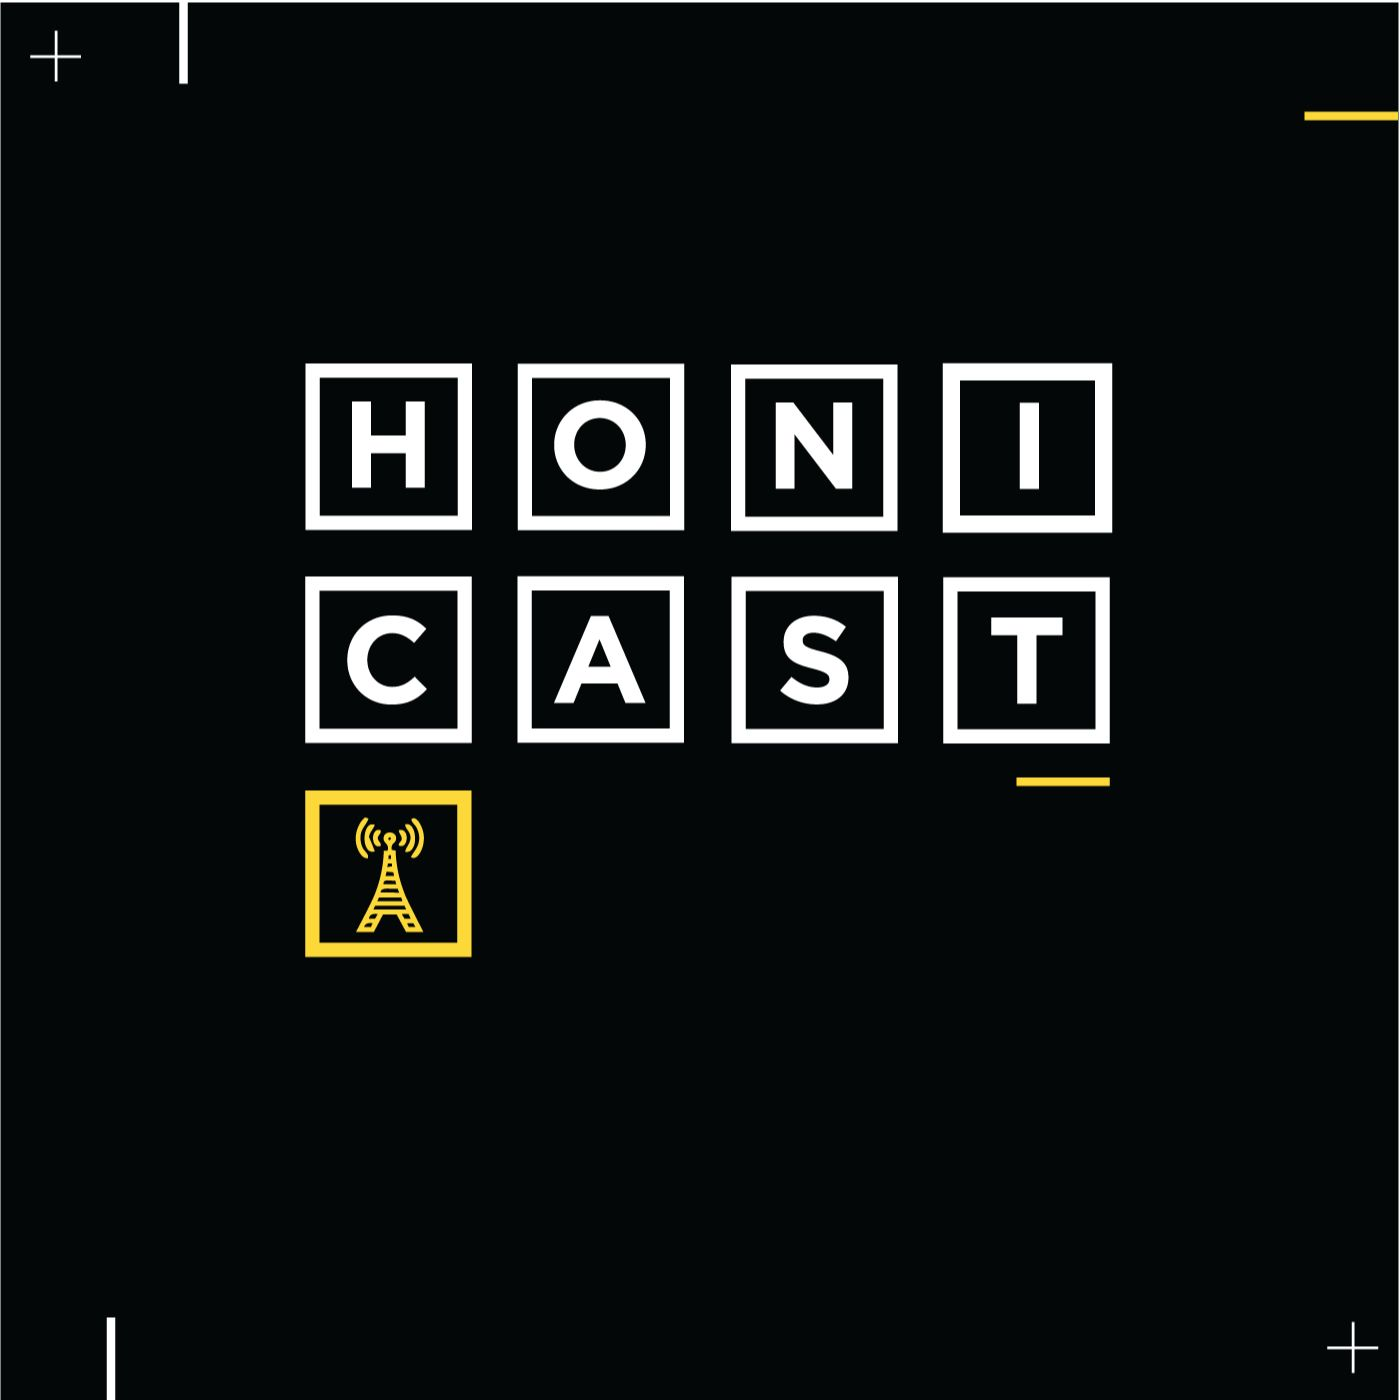 Honi Cast